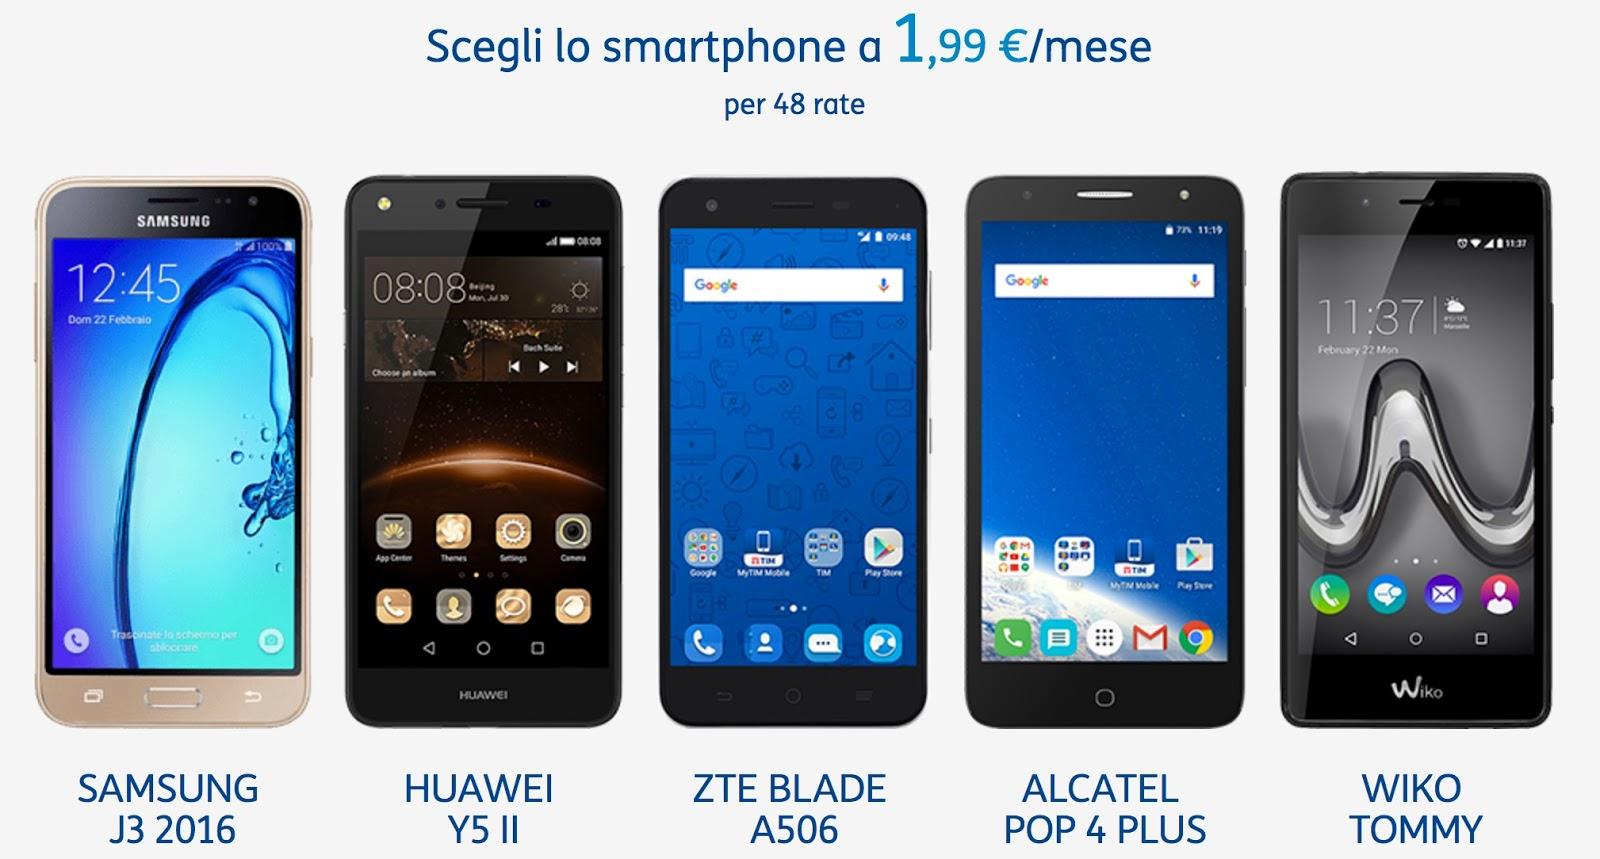 Smartphone con TIM a 1,99 €/mese per 48 rate